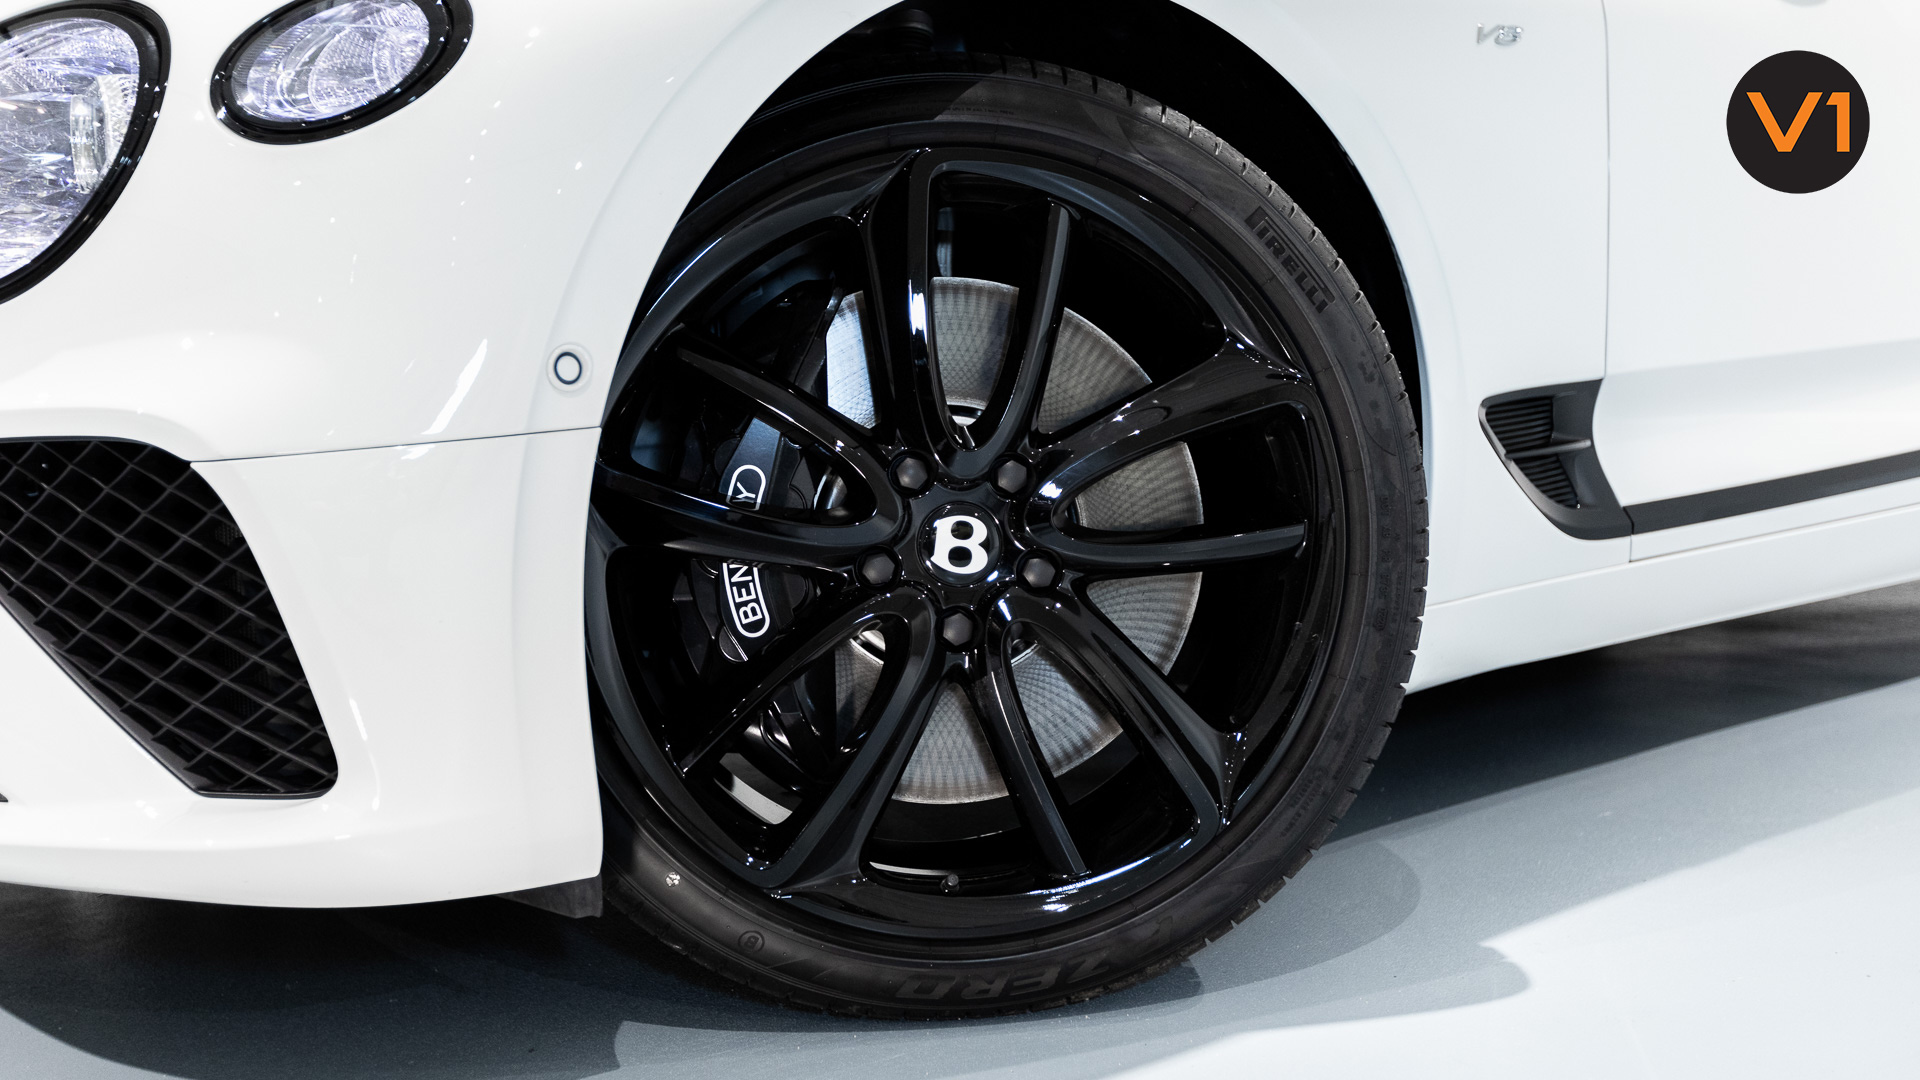 Bentley Continental GT Coupe V8 (Glacier White) - Wheels